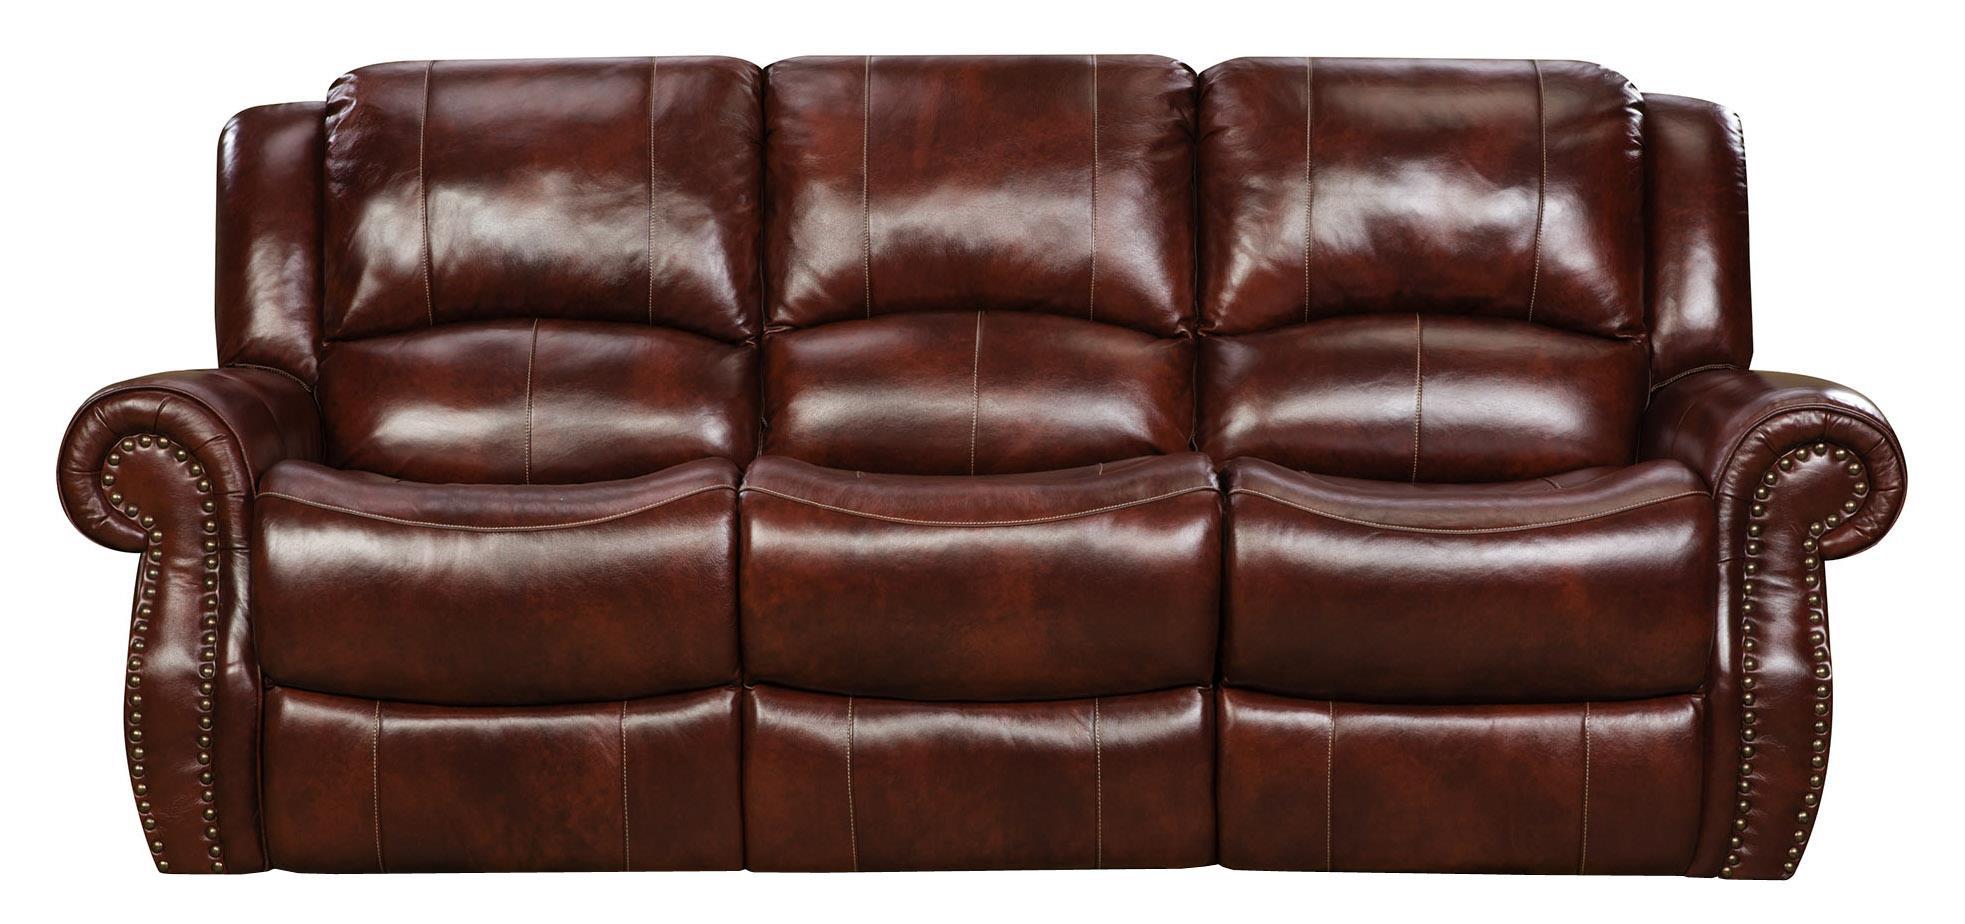 99901 Reclining Sofa by Corinthian at Furniture Fair - North Carolina